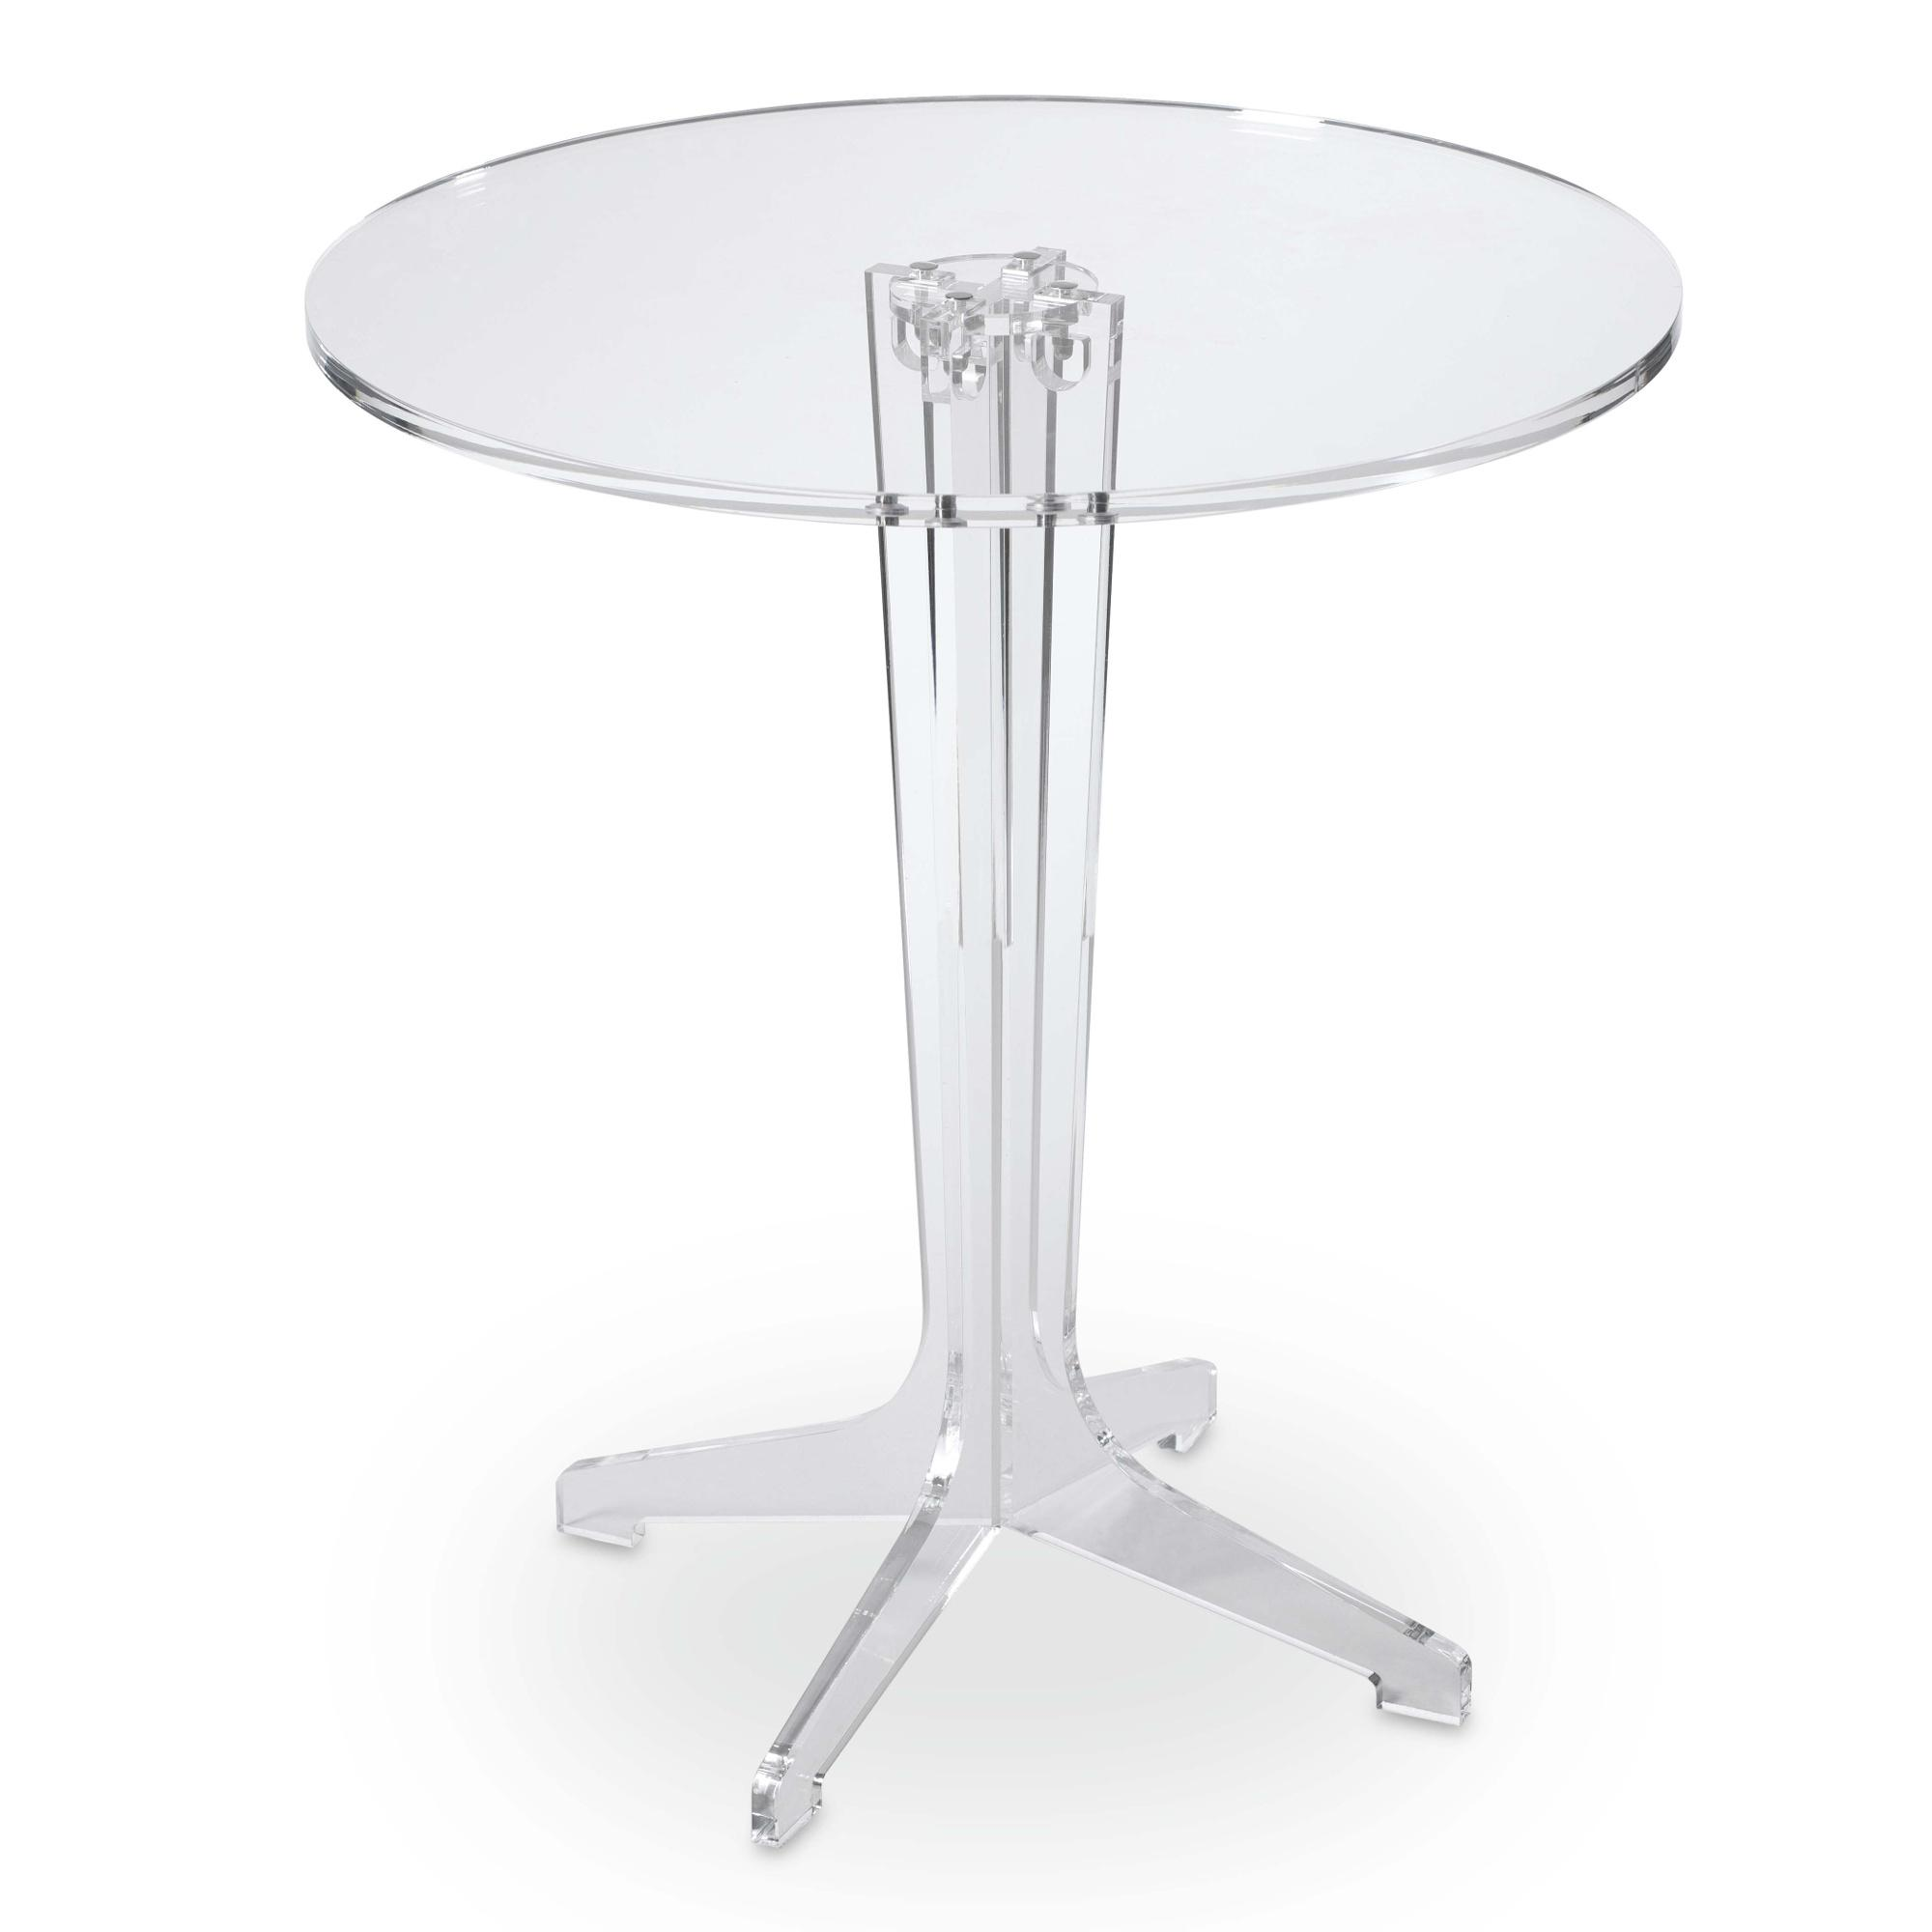 Tavolinetto rotondo diametro 50xh55 cm stanton in - Tavolini plexiglass ...